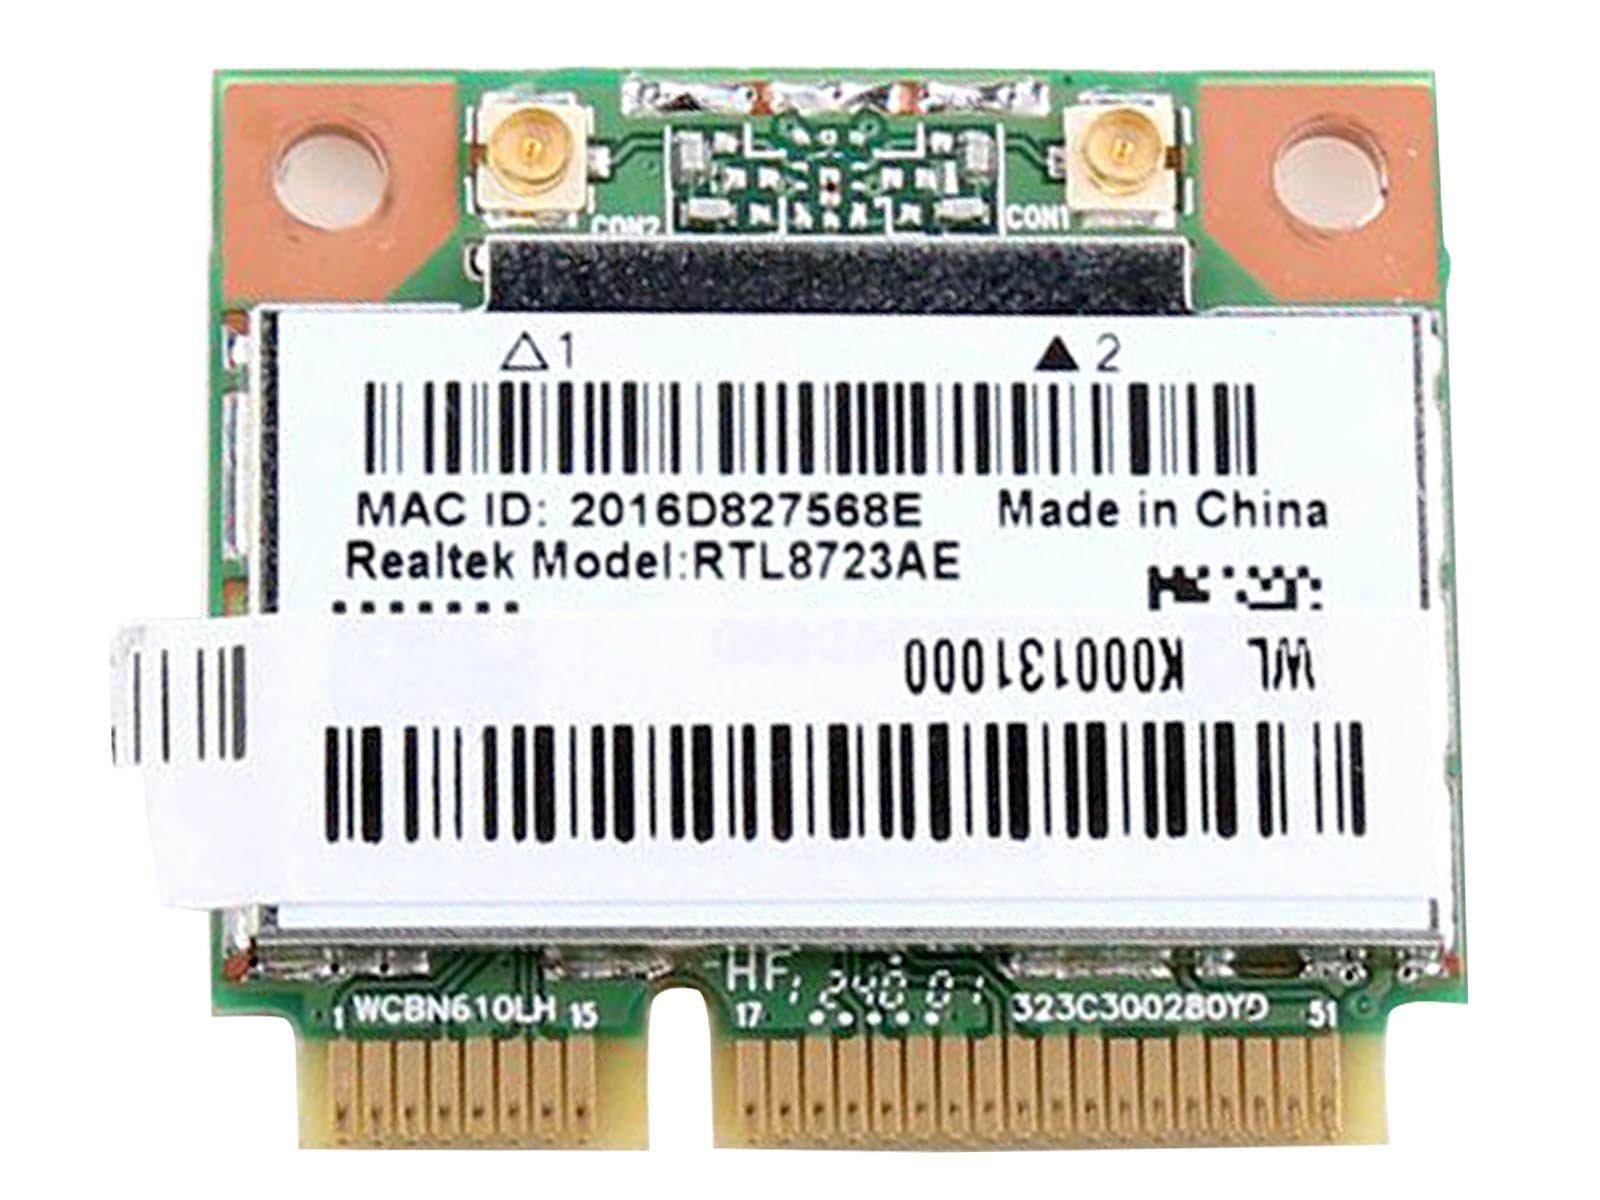 Realtek Rtl8723 Rtl8723ae Half Mini Pcie Bluetooth Wireless Wlan Wifi Card 802.11 B G N